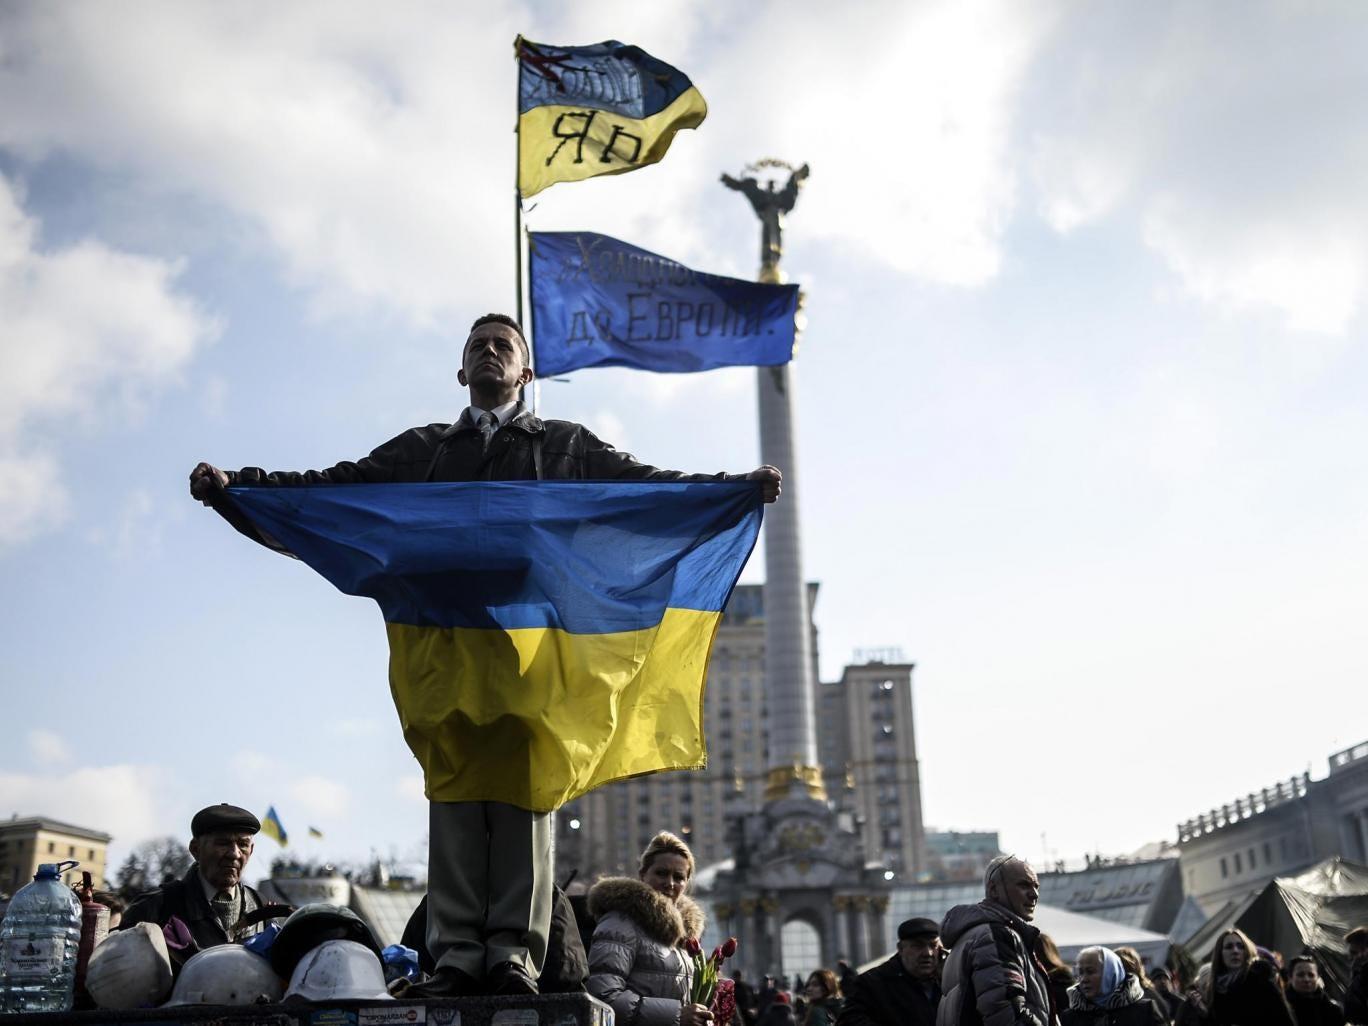 A protester wraps himself in the Ukraine flag in Kiev yesterday